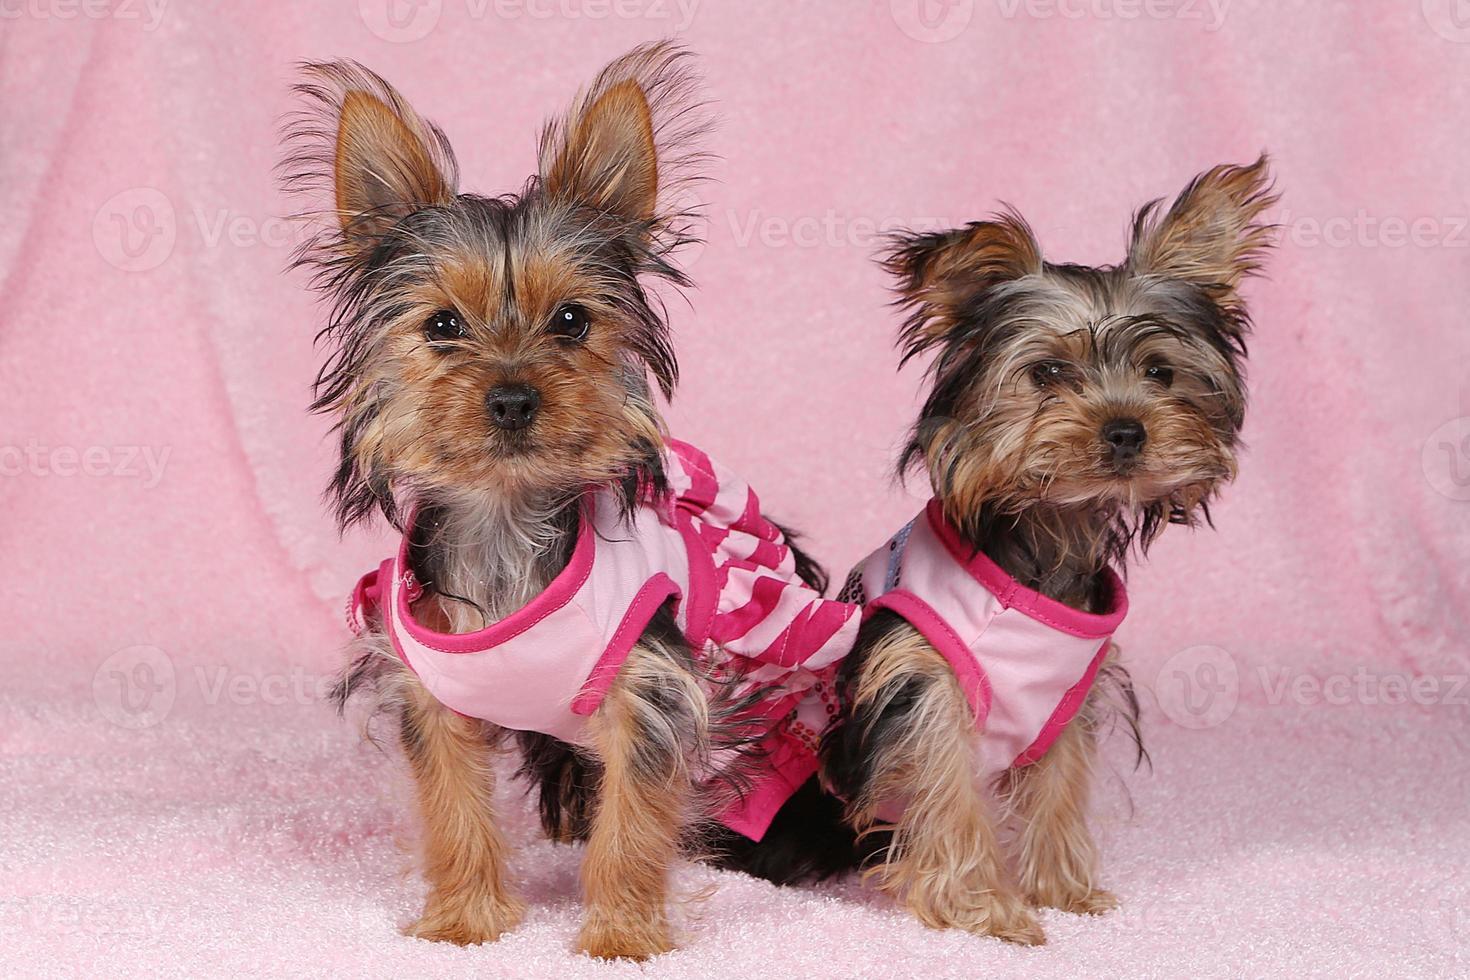 yorkshire terrier-puppy's gekleed in roze foto